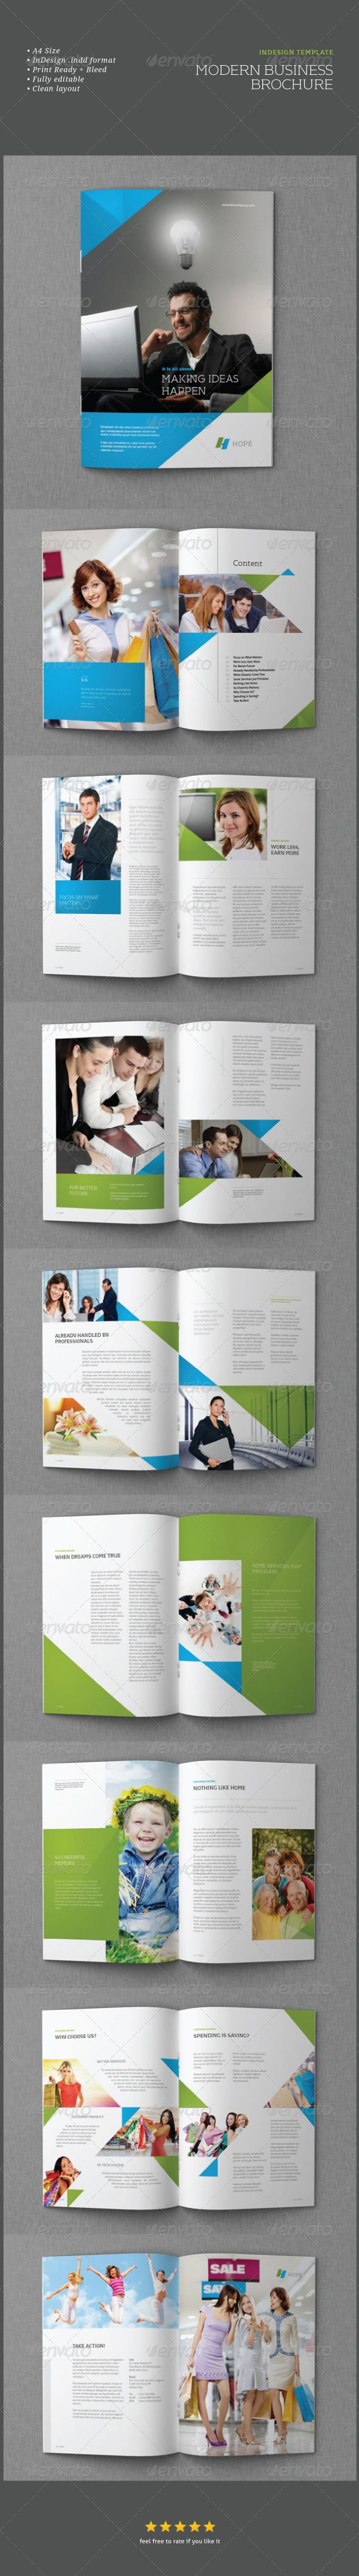 InDesign Modern Business Brochure Template | Diseño editorial ...